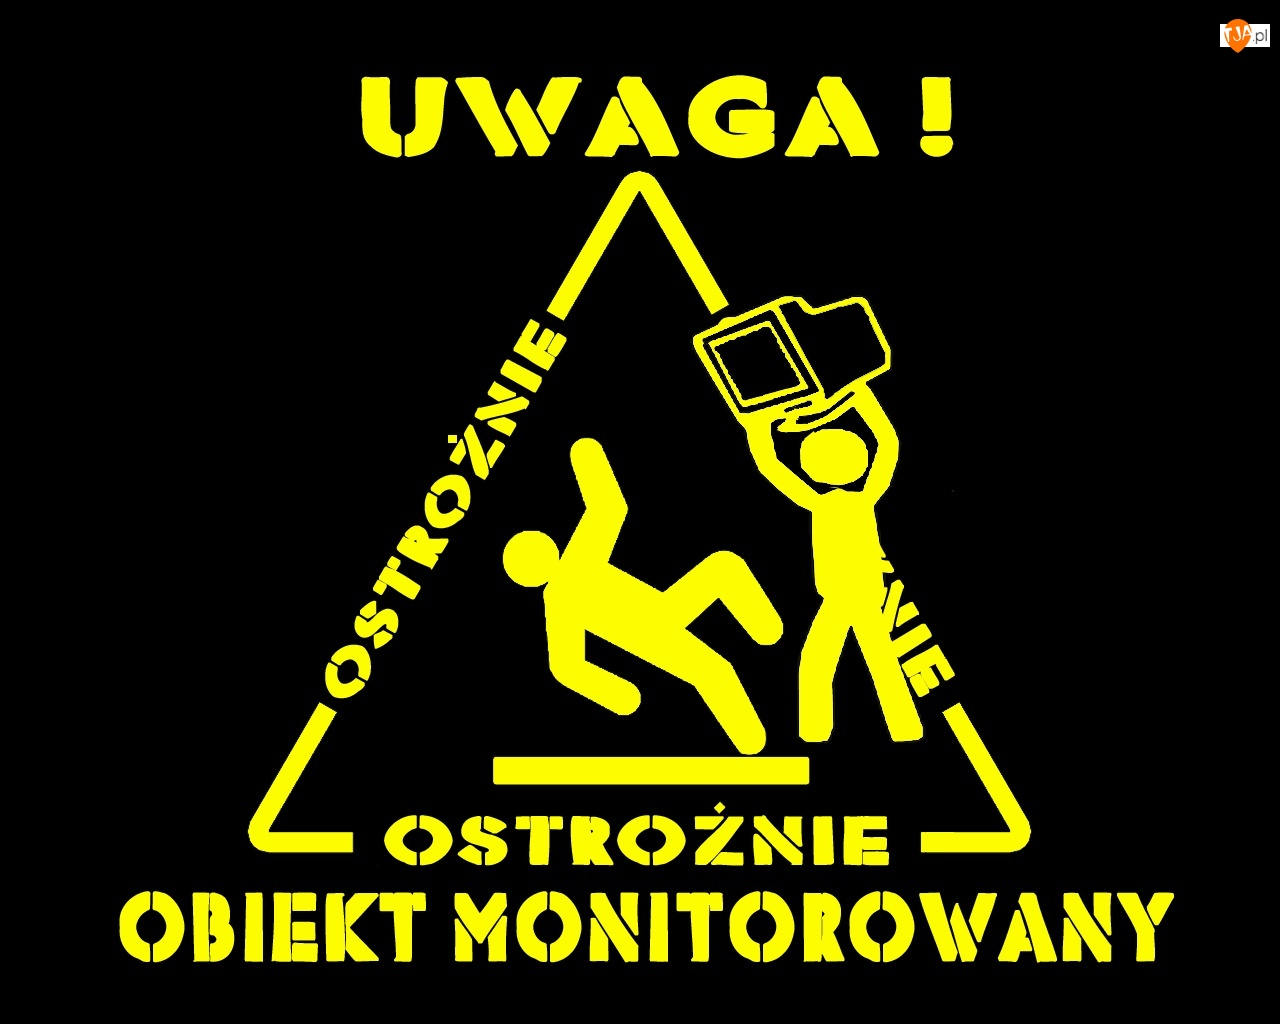 Monitorowany, Uwaga, Obiekt